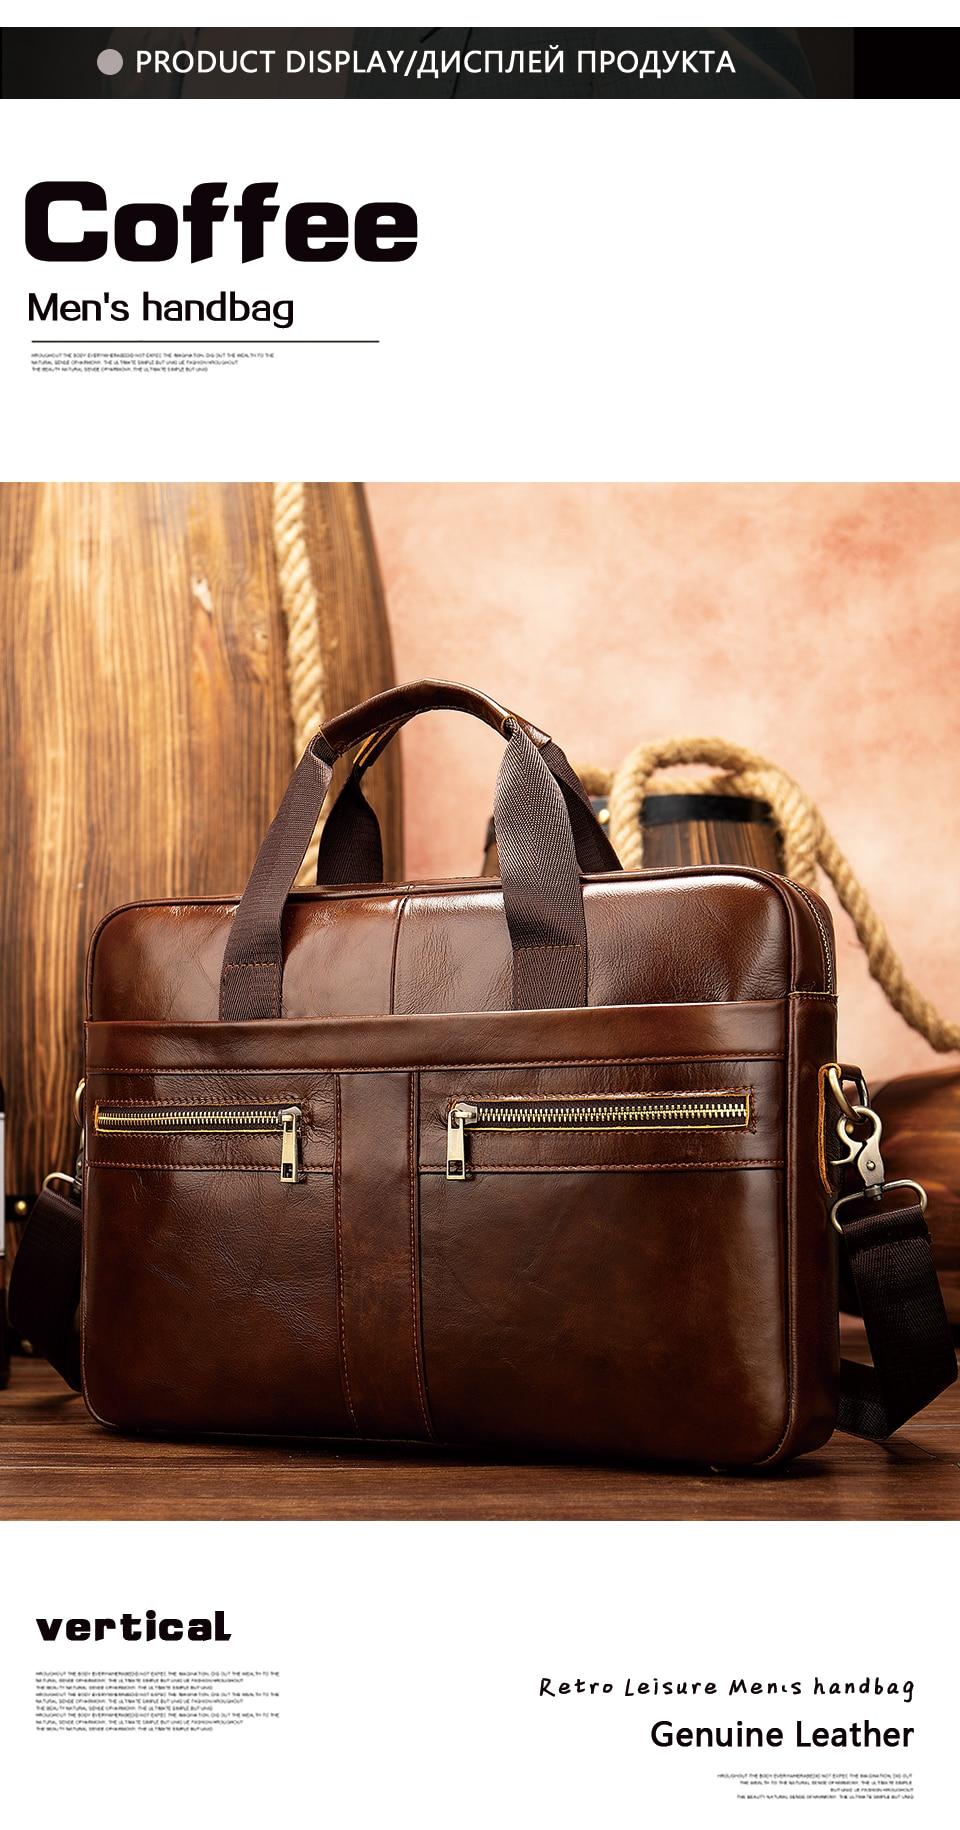 HTB1zdZDa8r0gK0jSZFnq6zRRXXai WESTAL Bag men's Genuine Leather briefcase Male man laptop bag natural Leather for men Messenger bags men's briefcases 2019